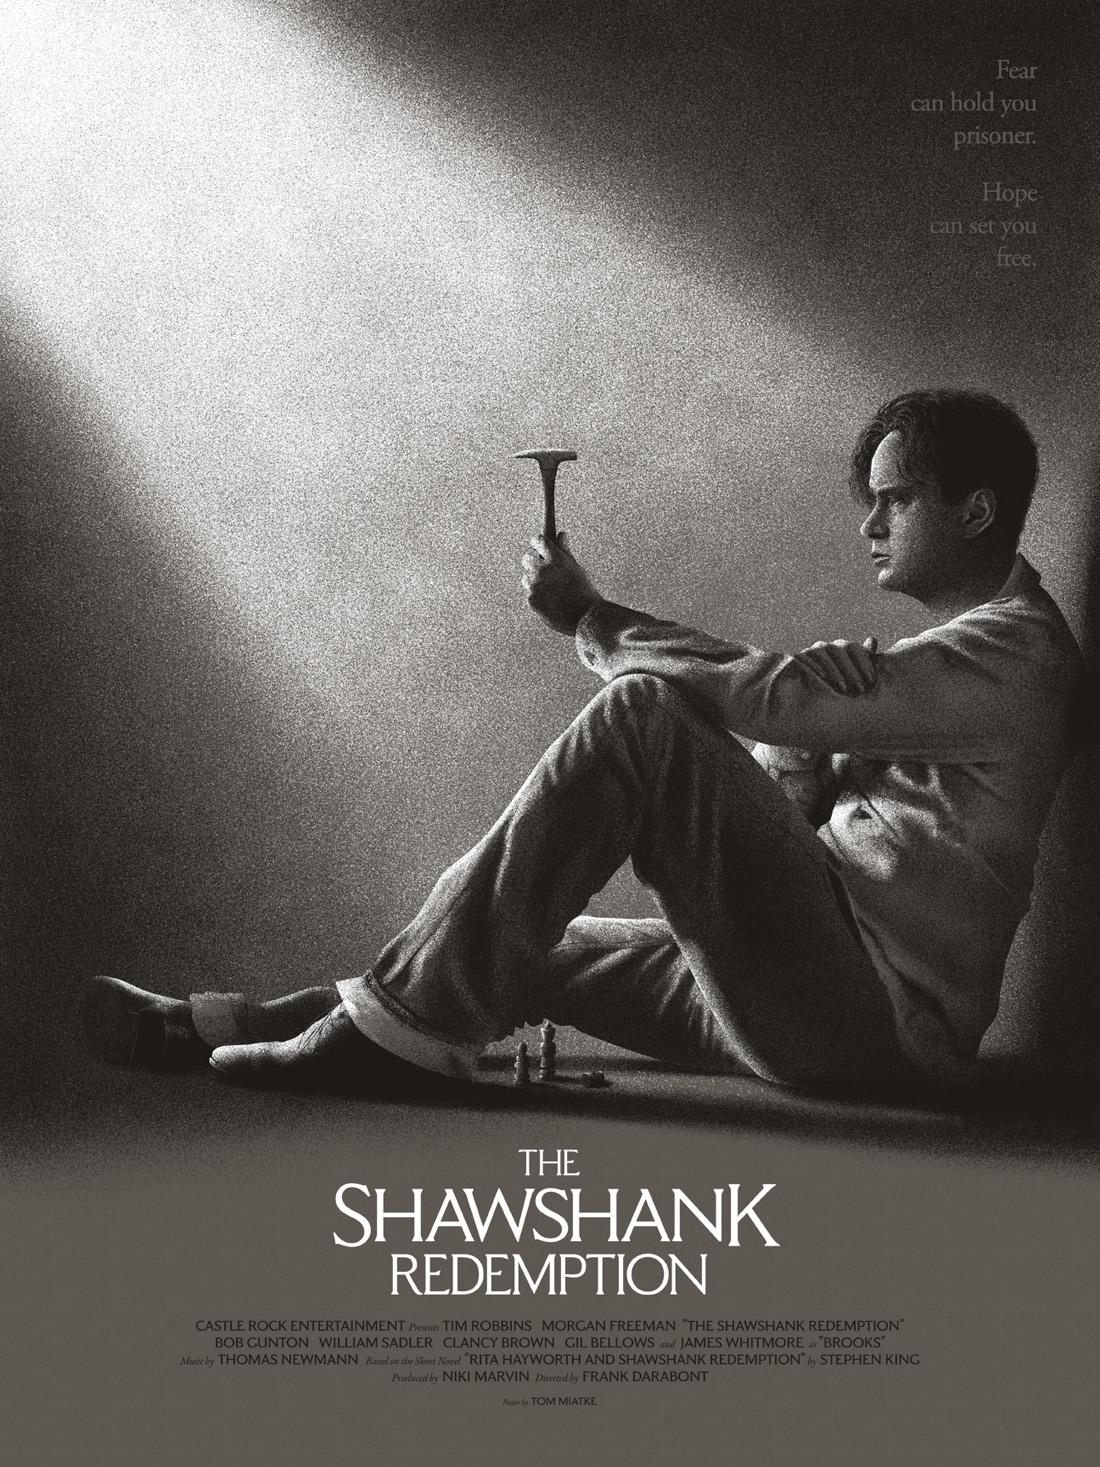 Shawshank Redemption  AP Edition of 10 2 Colour Screenprint $35USD